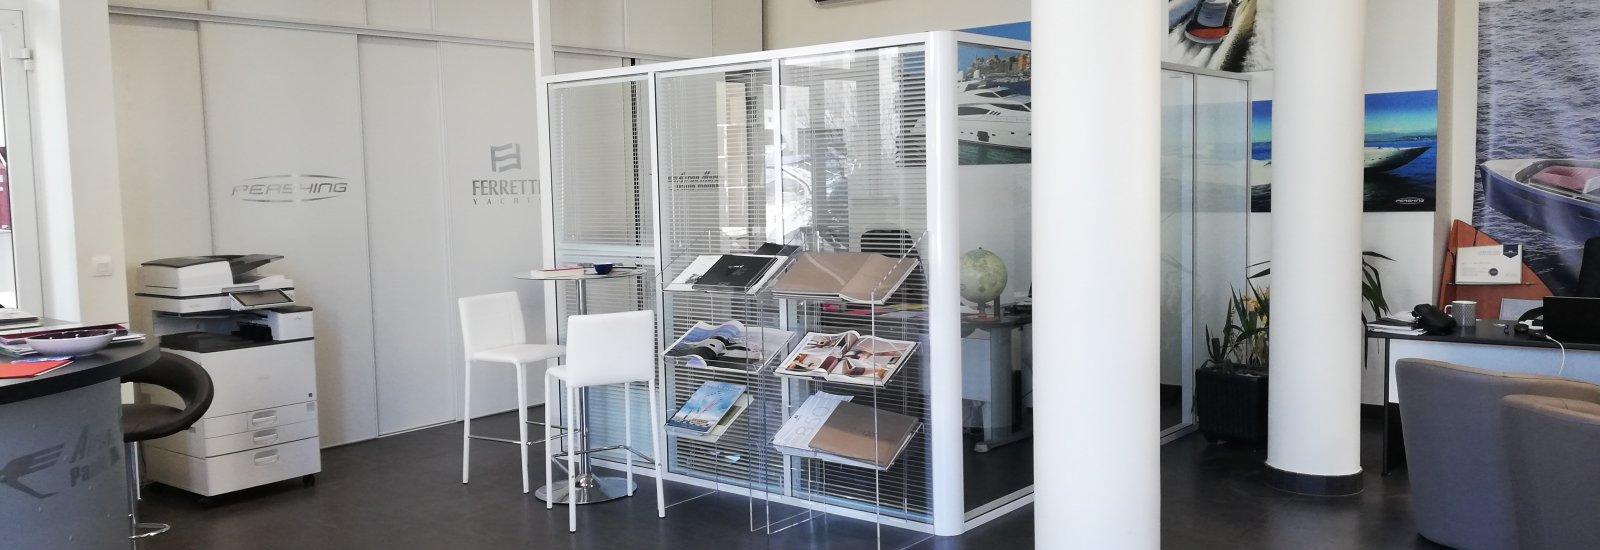 bureau JMA Yachting Port-Fréjus Fréjus vente location bateaux neuf occasion